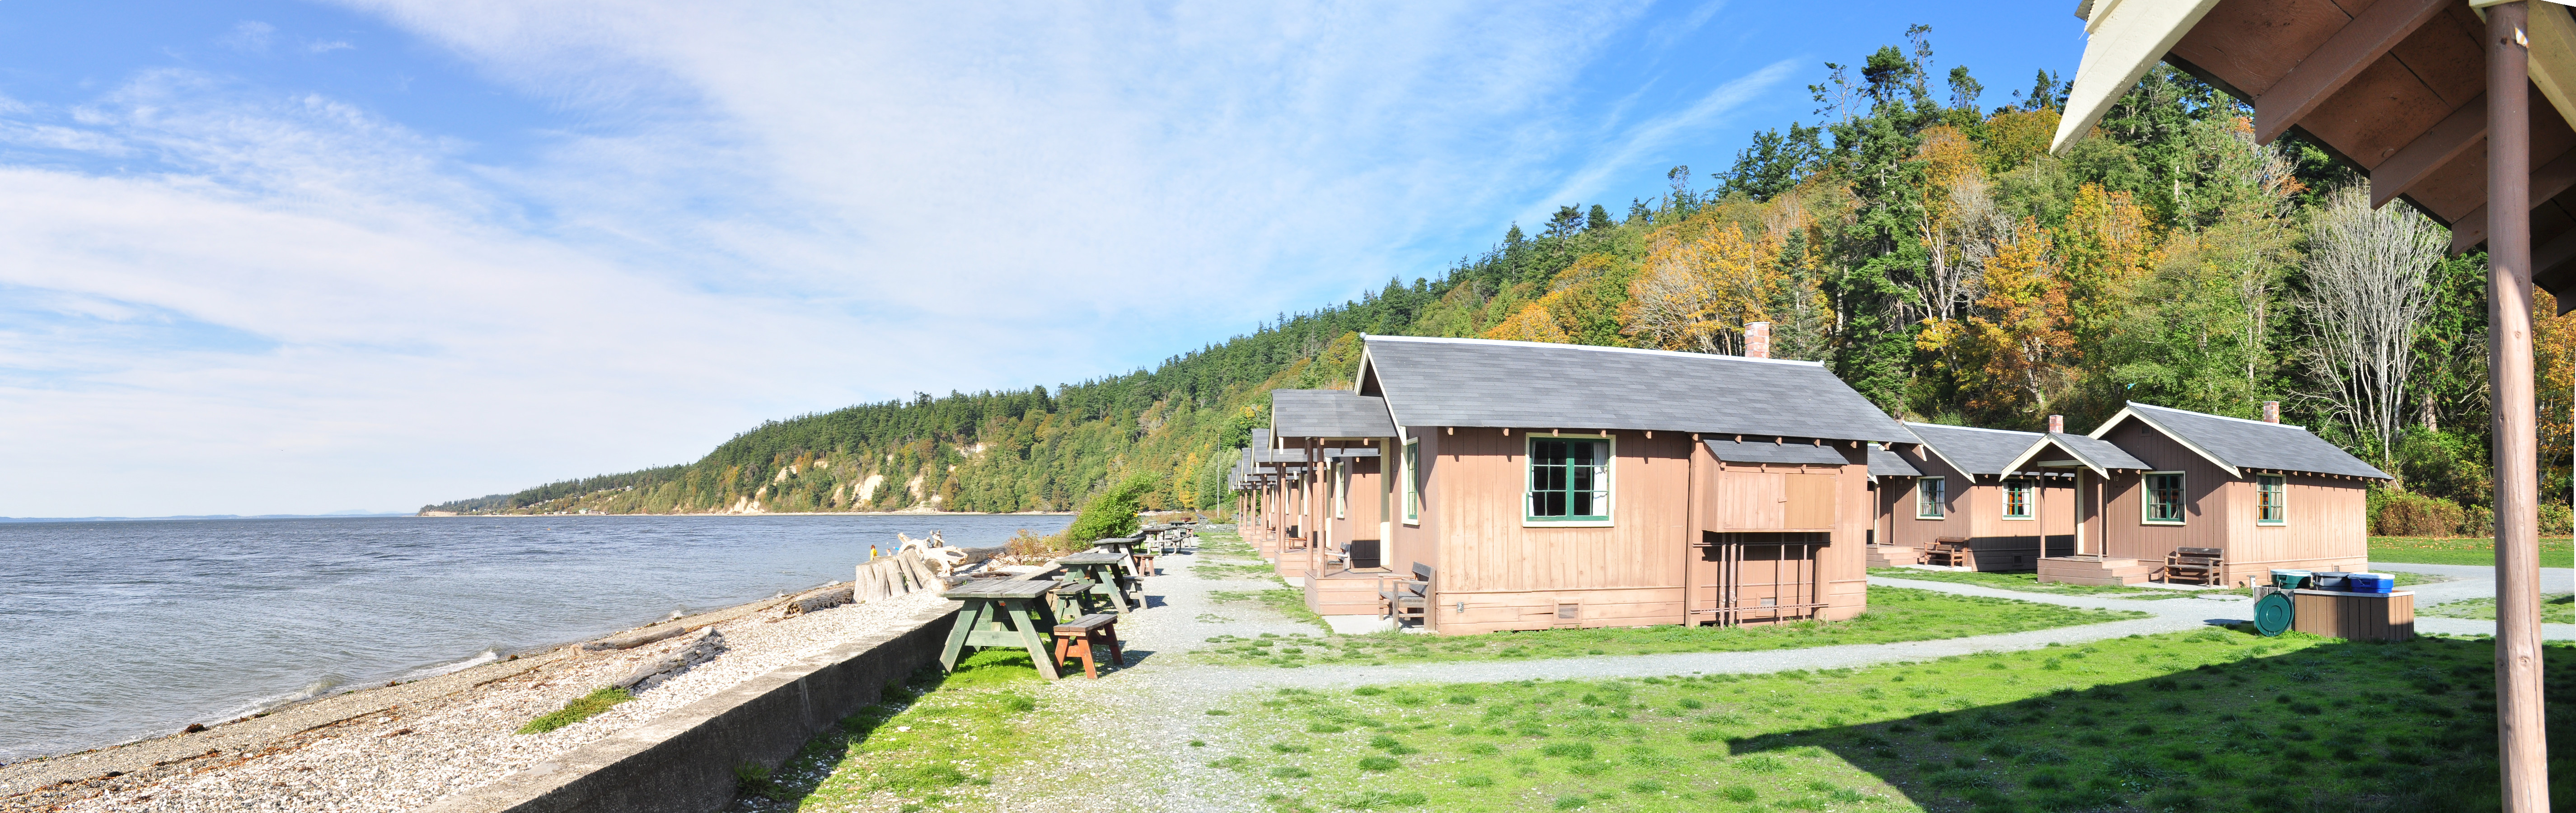 Cama Beach State Park Boat Rental